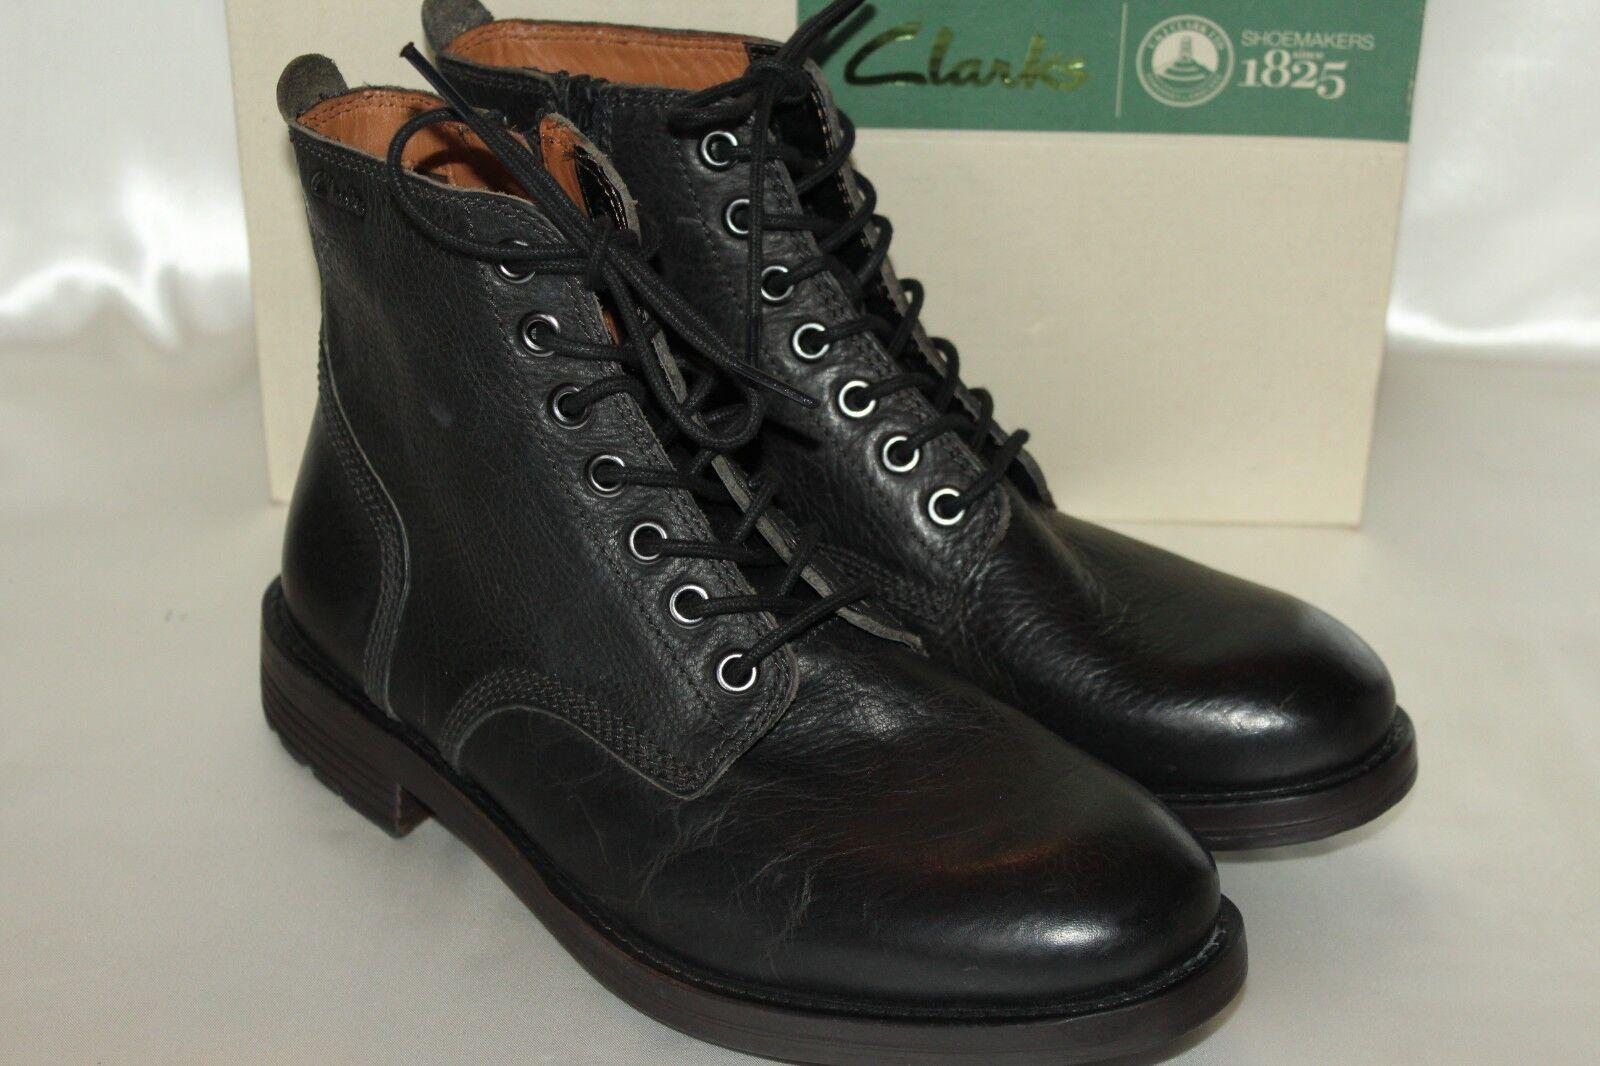 NEW  CLARKS Mens Black Leather FAULKNER RISE Zip Boots Sz 7  150